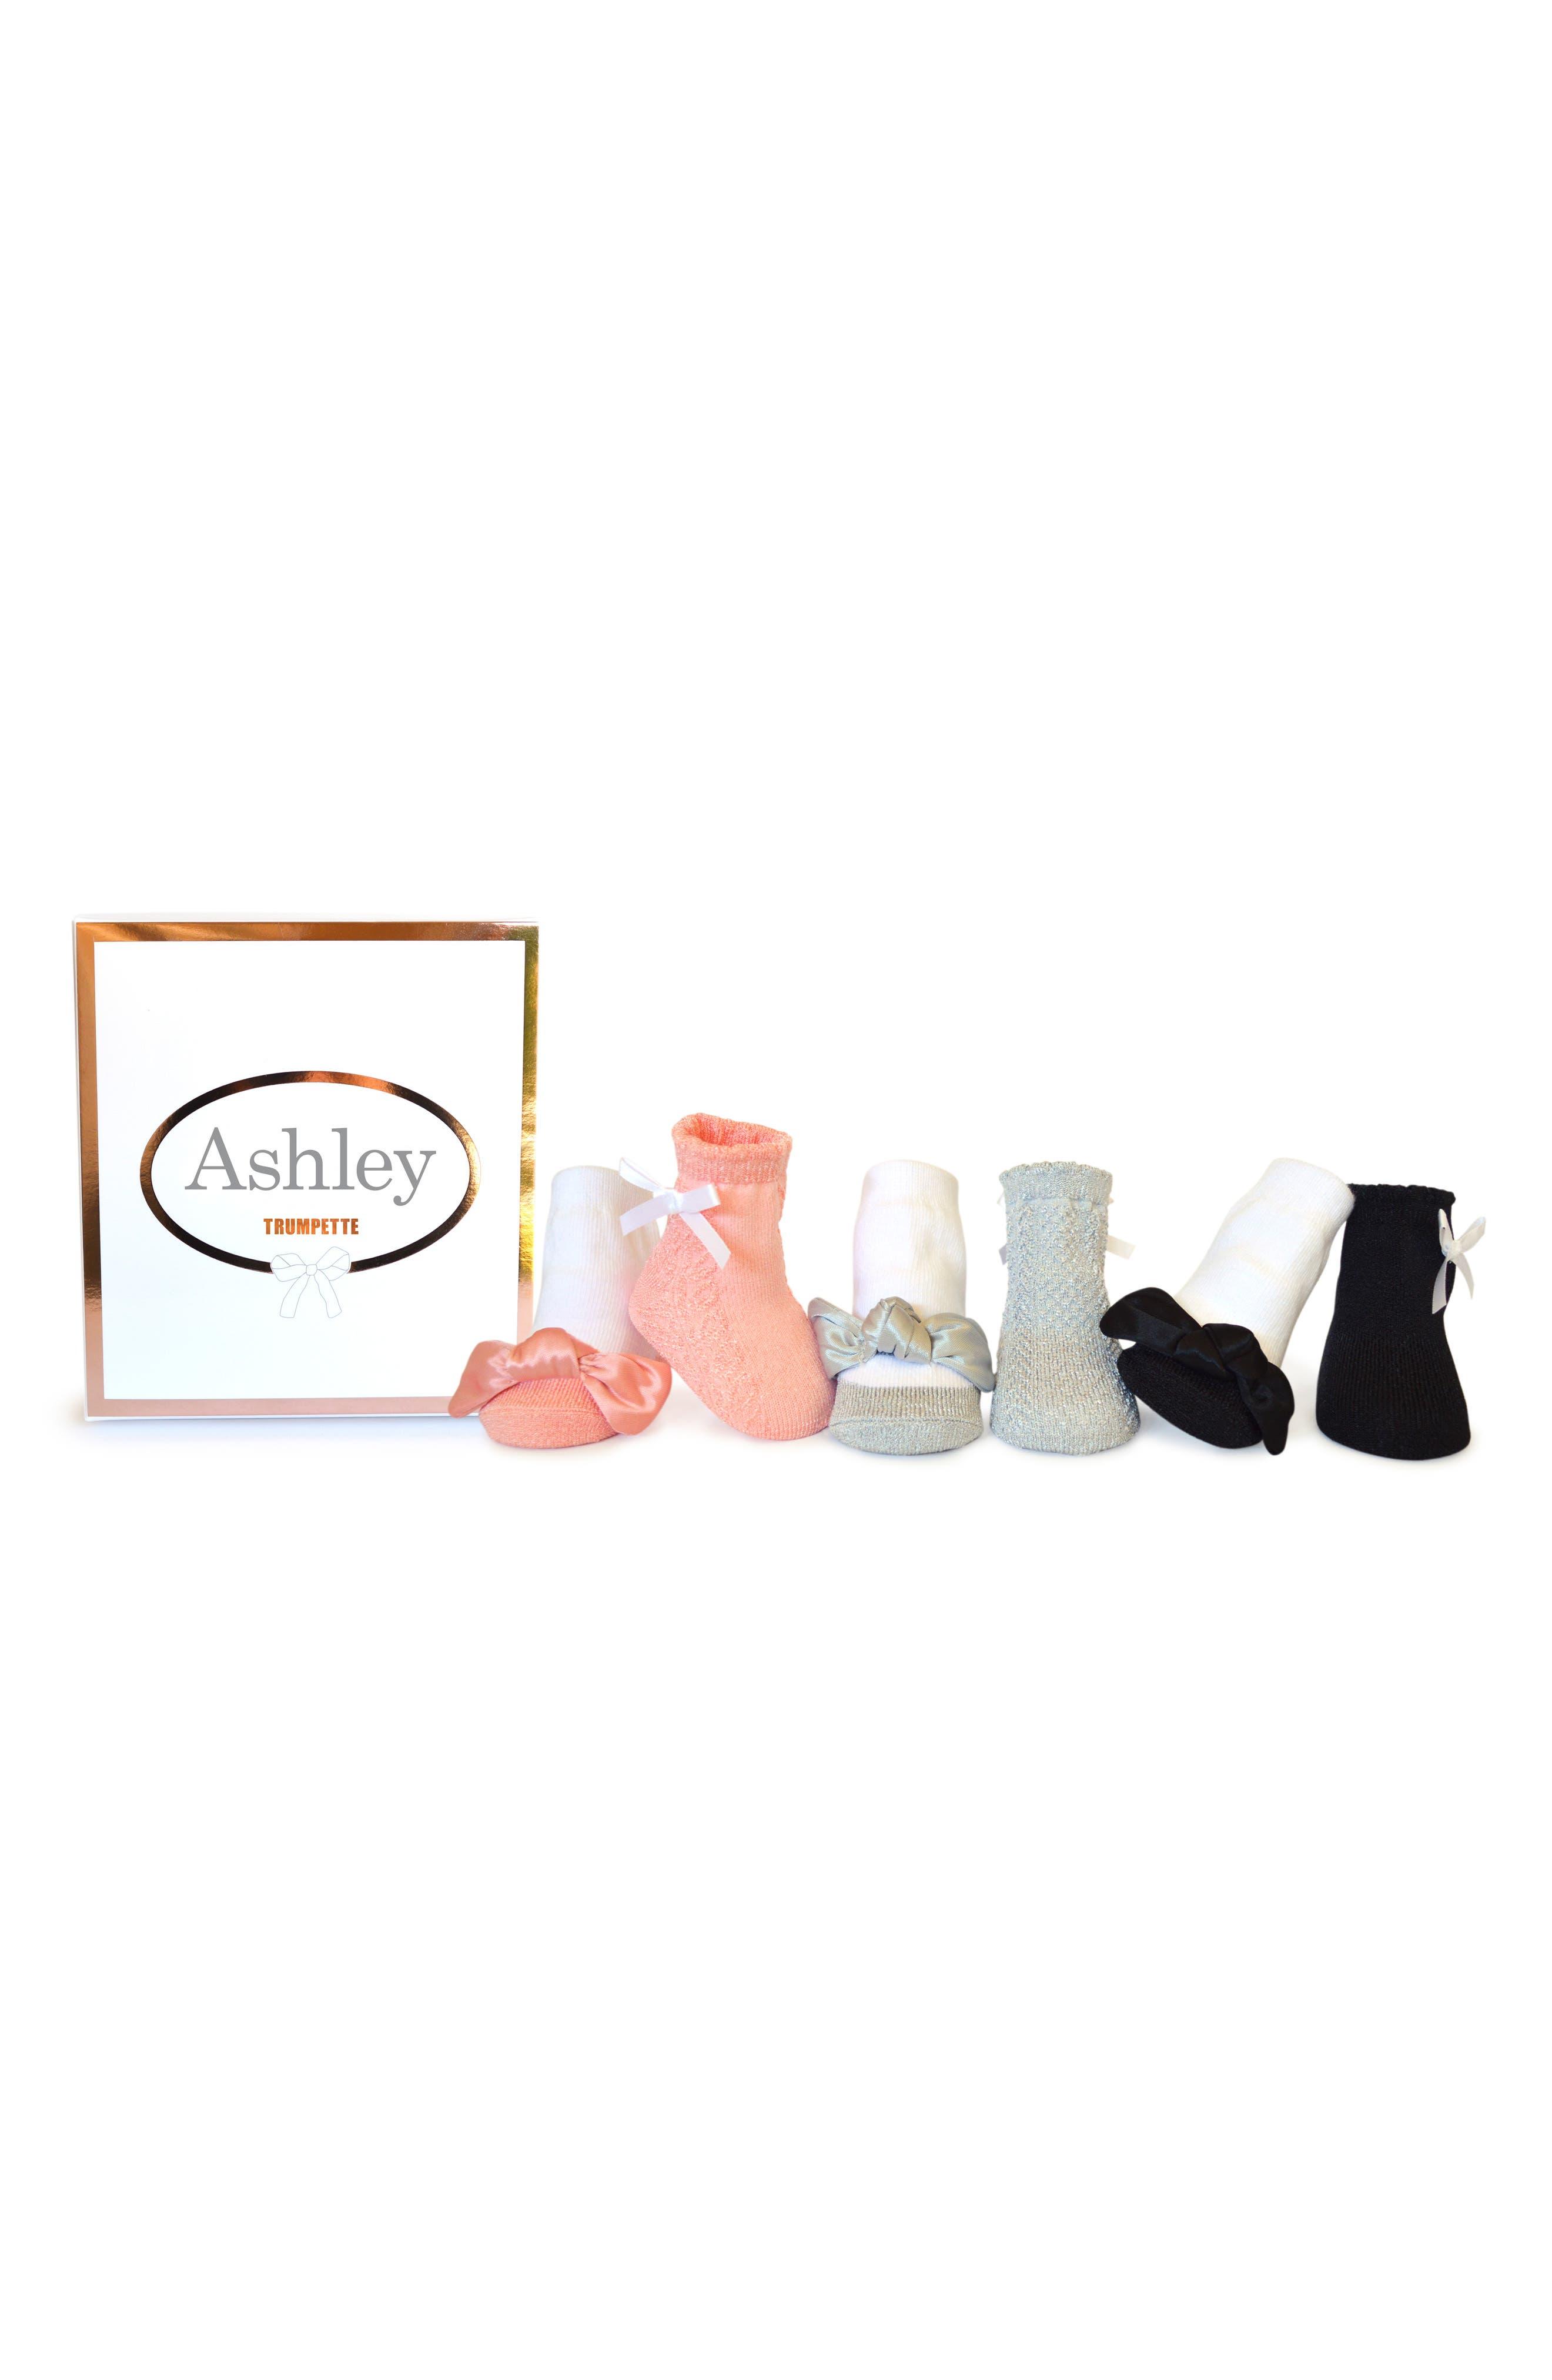 Ashley 6-Pack Socks,                             Main thumbnail 1, color,                             651